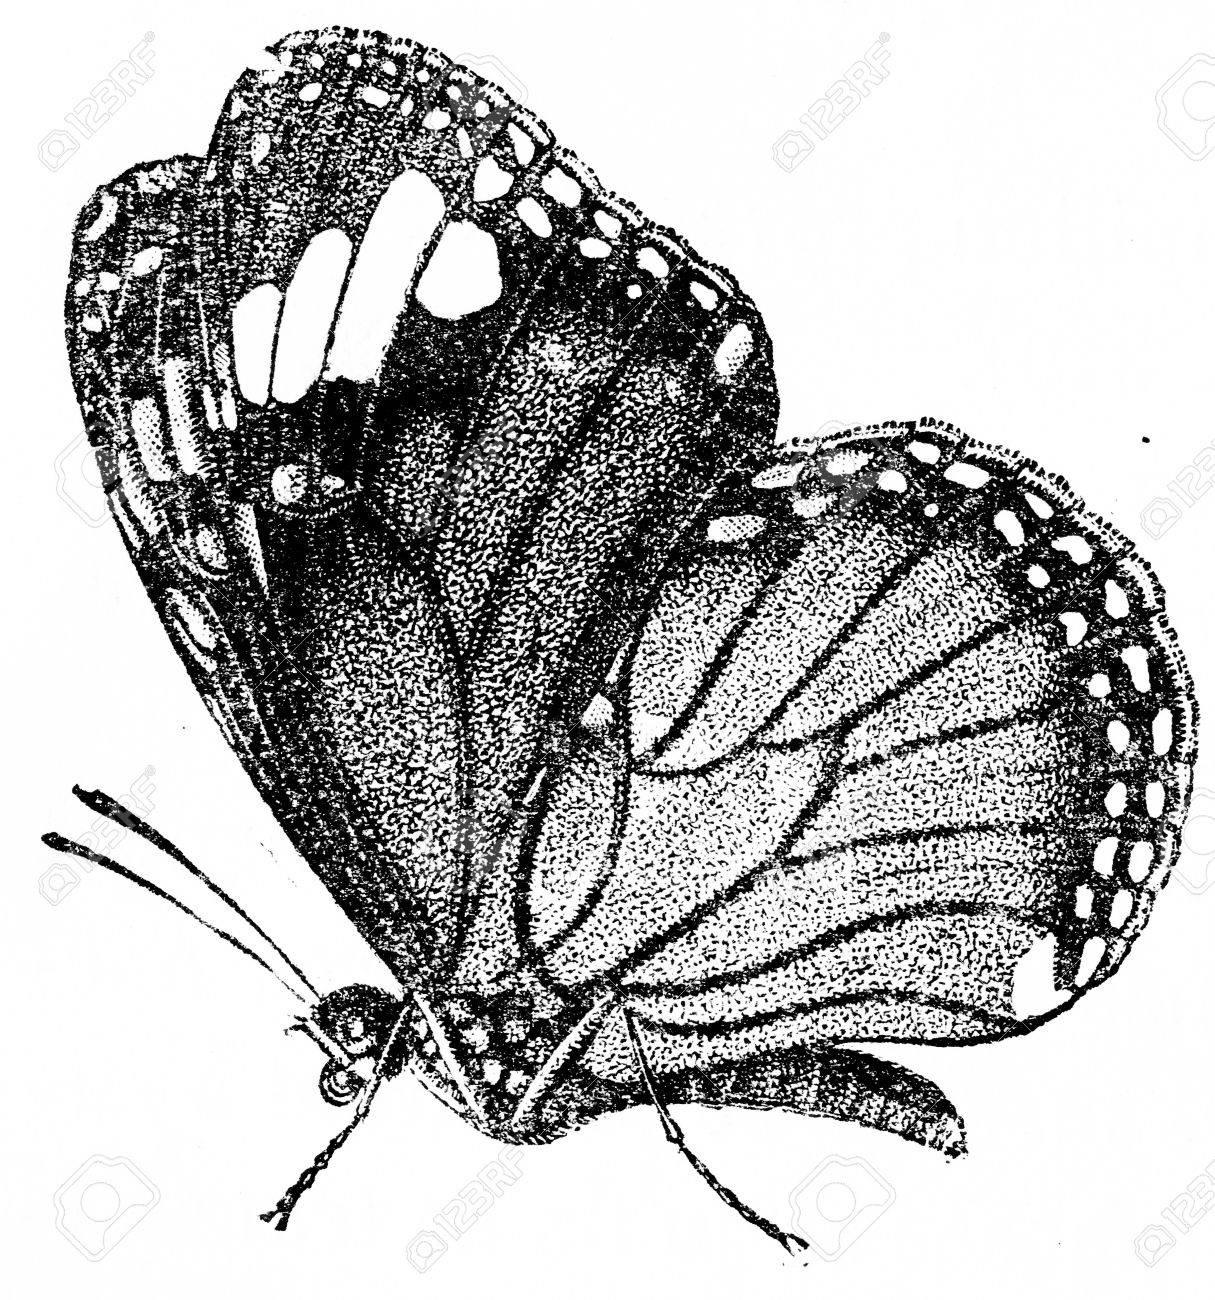 Danaida plexippus, vintage engraved illustration. Natural History of Animals, 1880. - 40102562